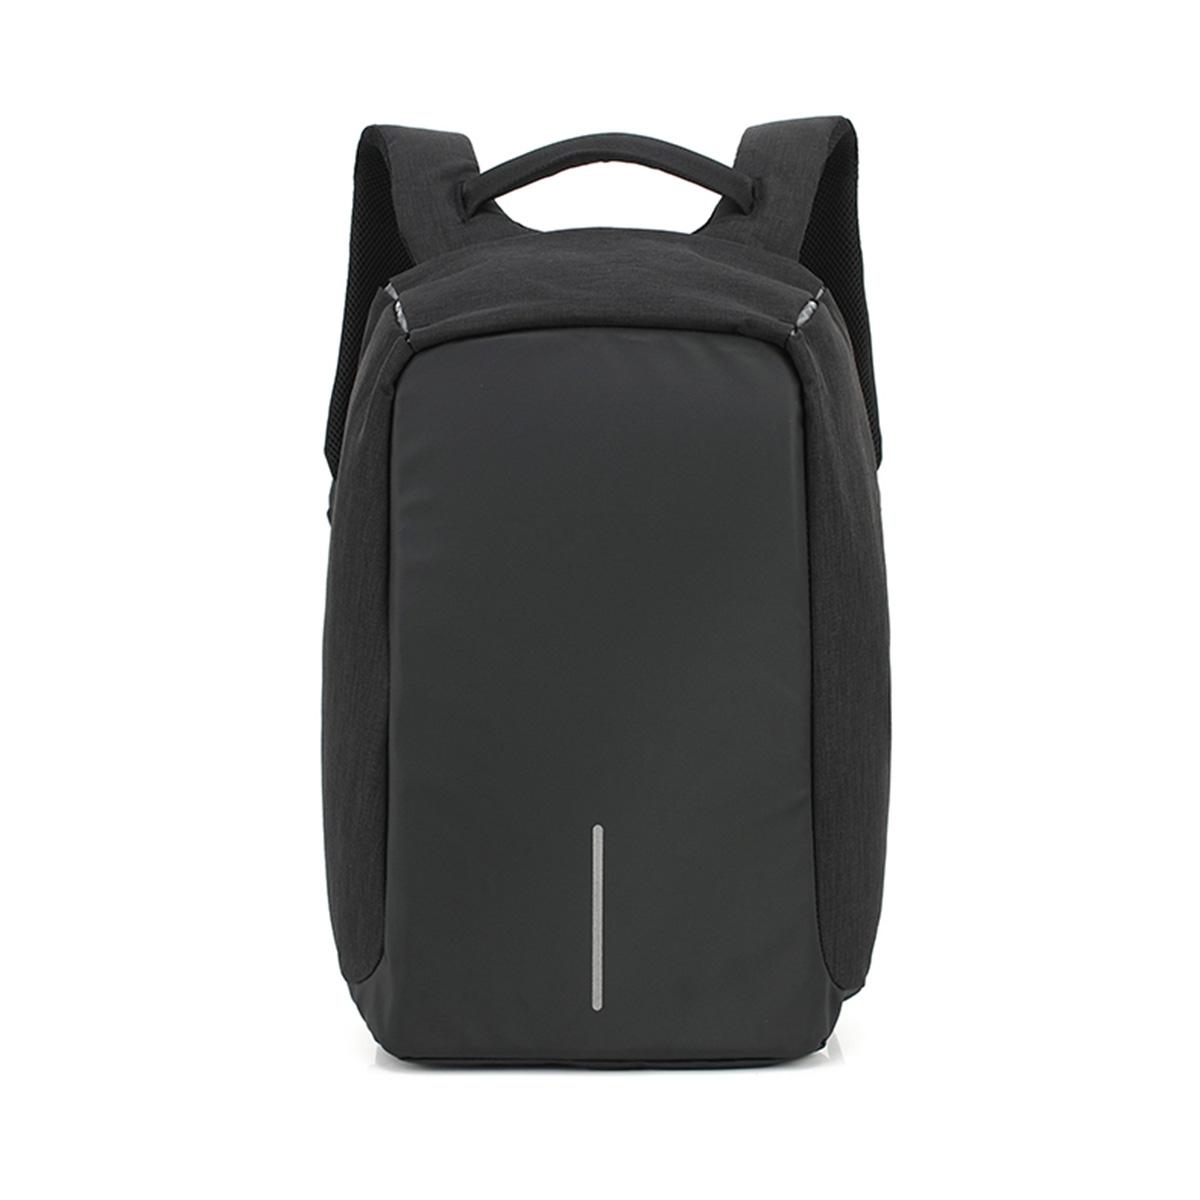 76a03c5b27 Σακίδιο Πλάτης Αντικλεπτικό Ozuko Anti Theft Laptop Backpack 8798 ...